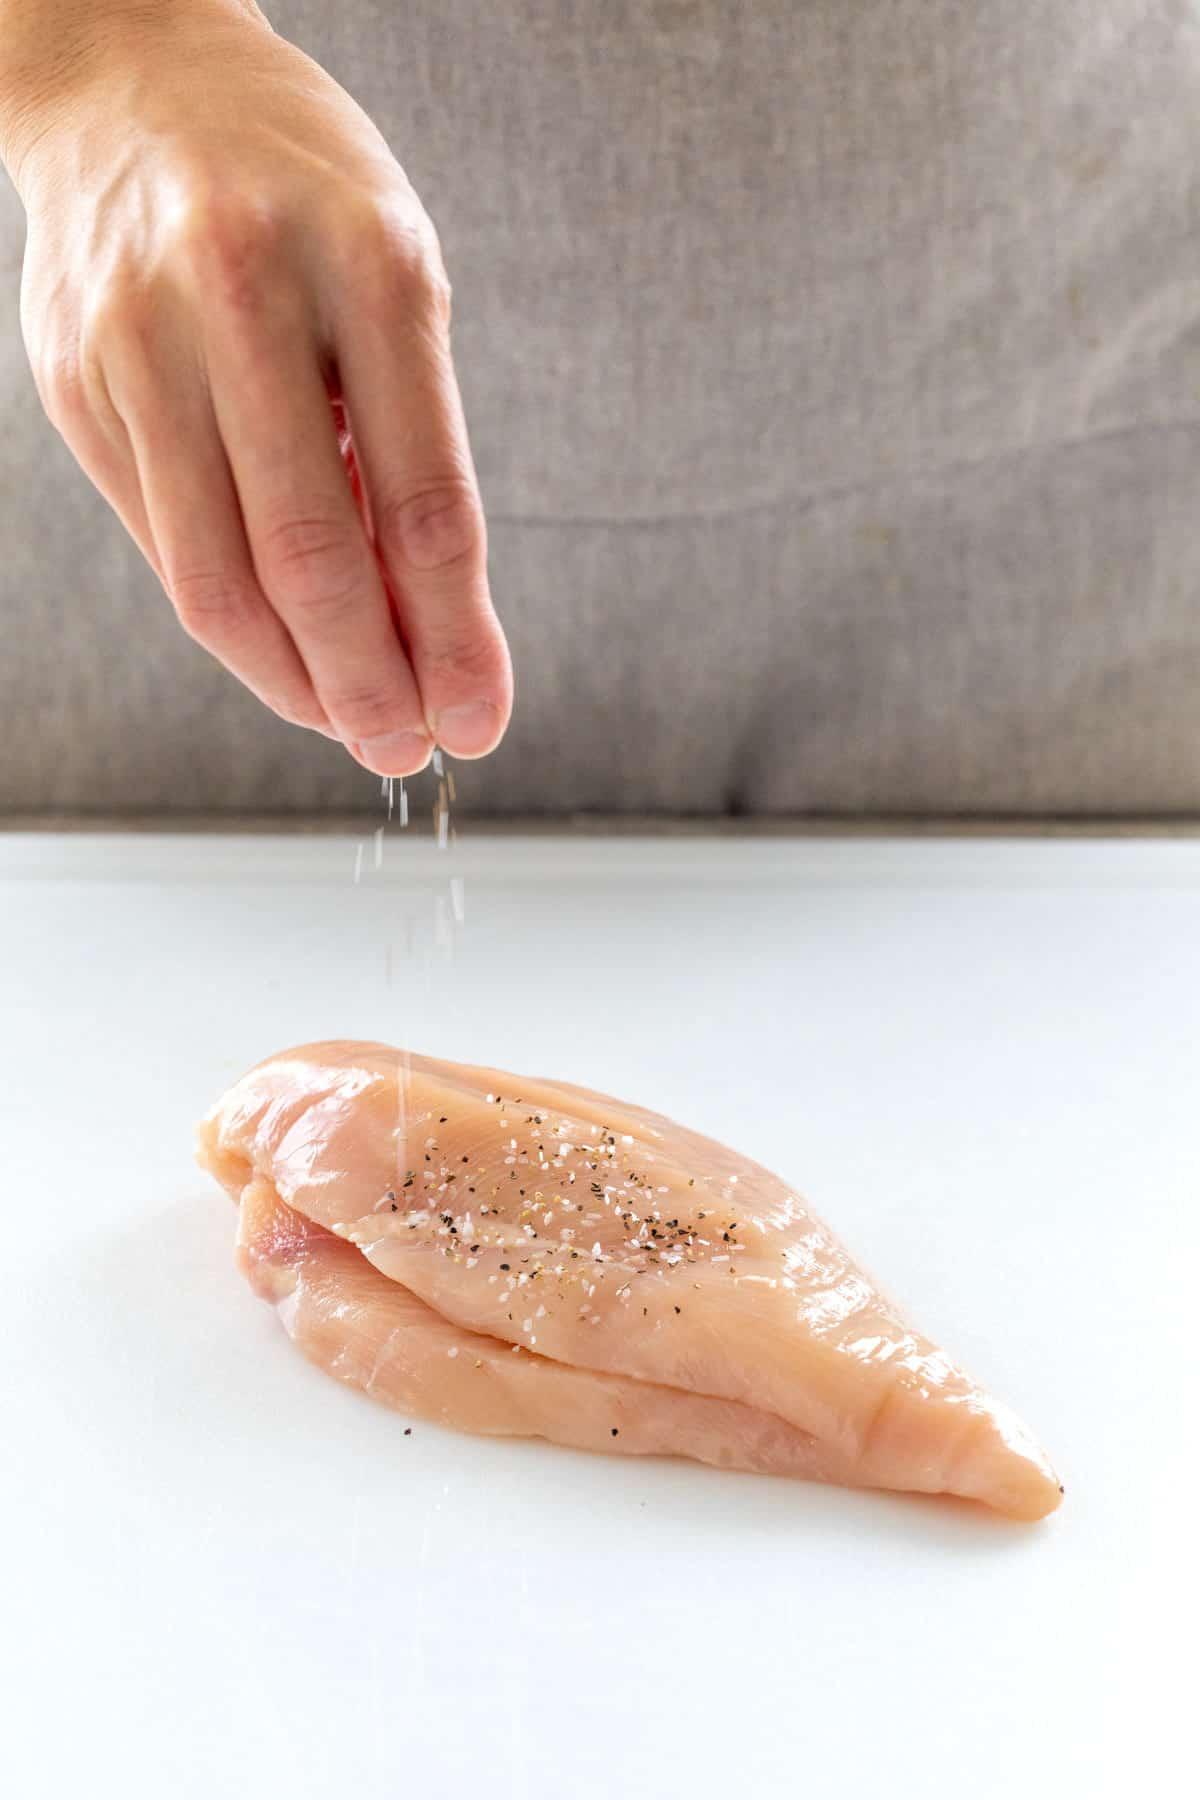 seasoning the chicken surface